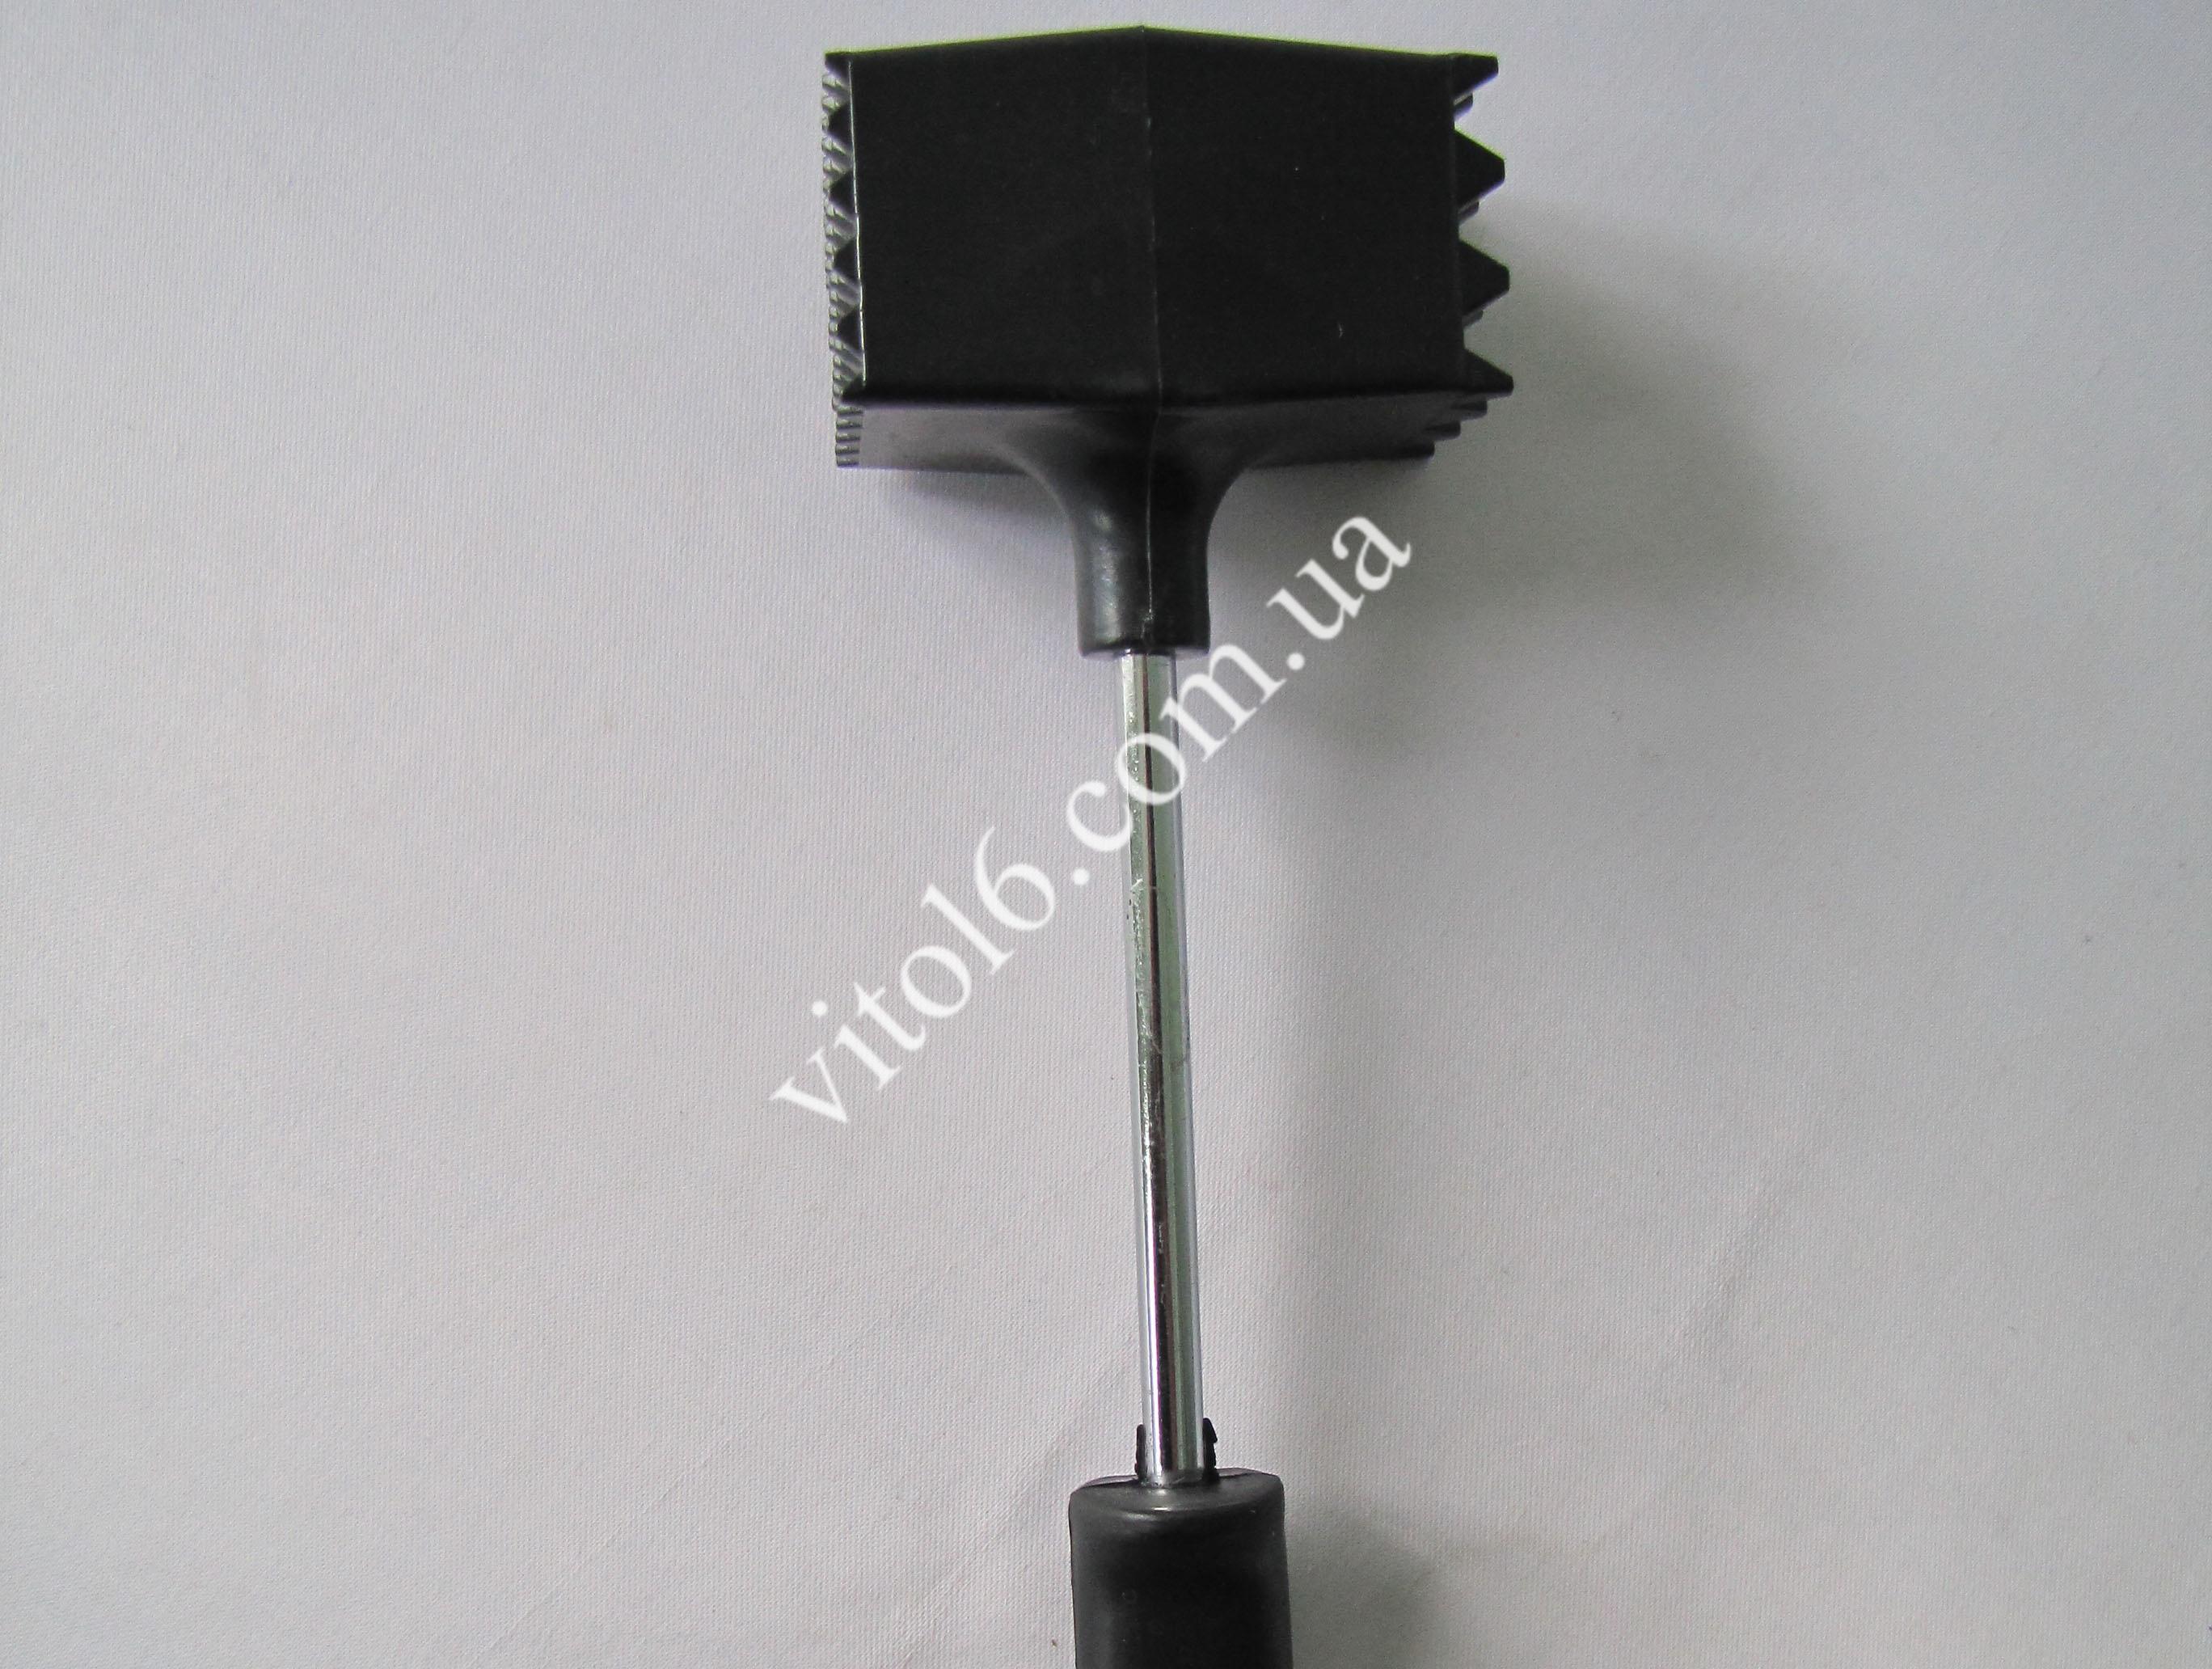 Молоток метал.+пластм. VT6-14173-1(144шт)